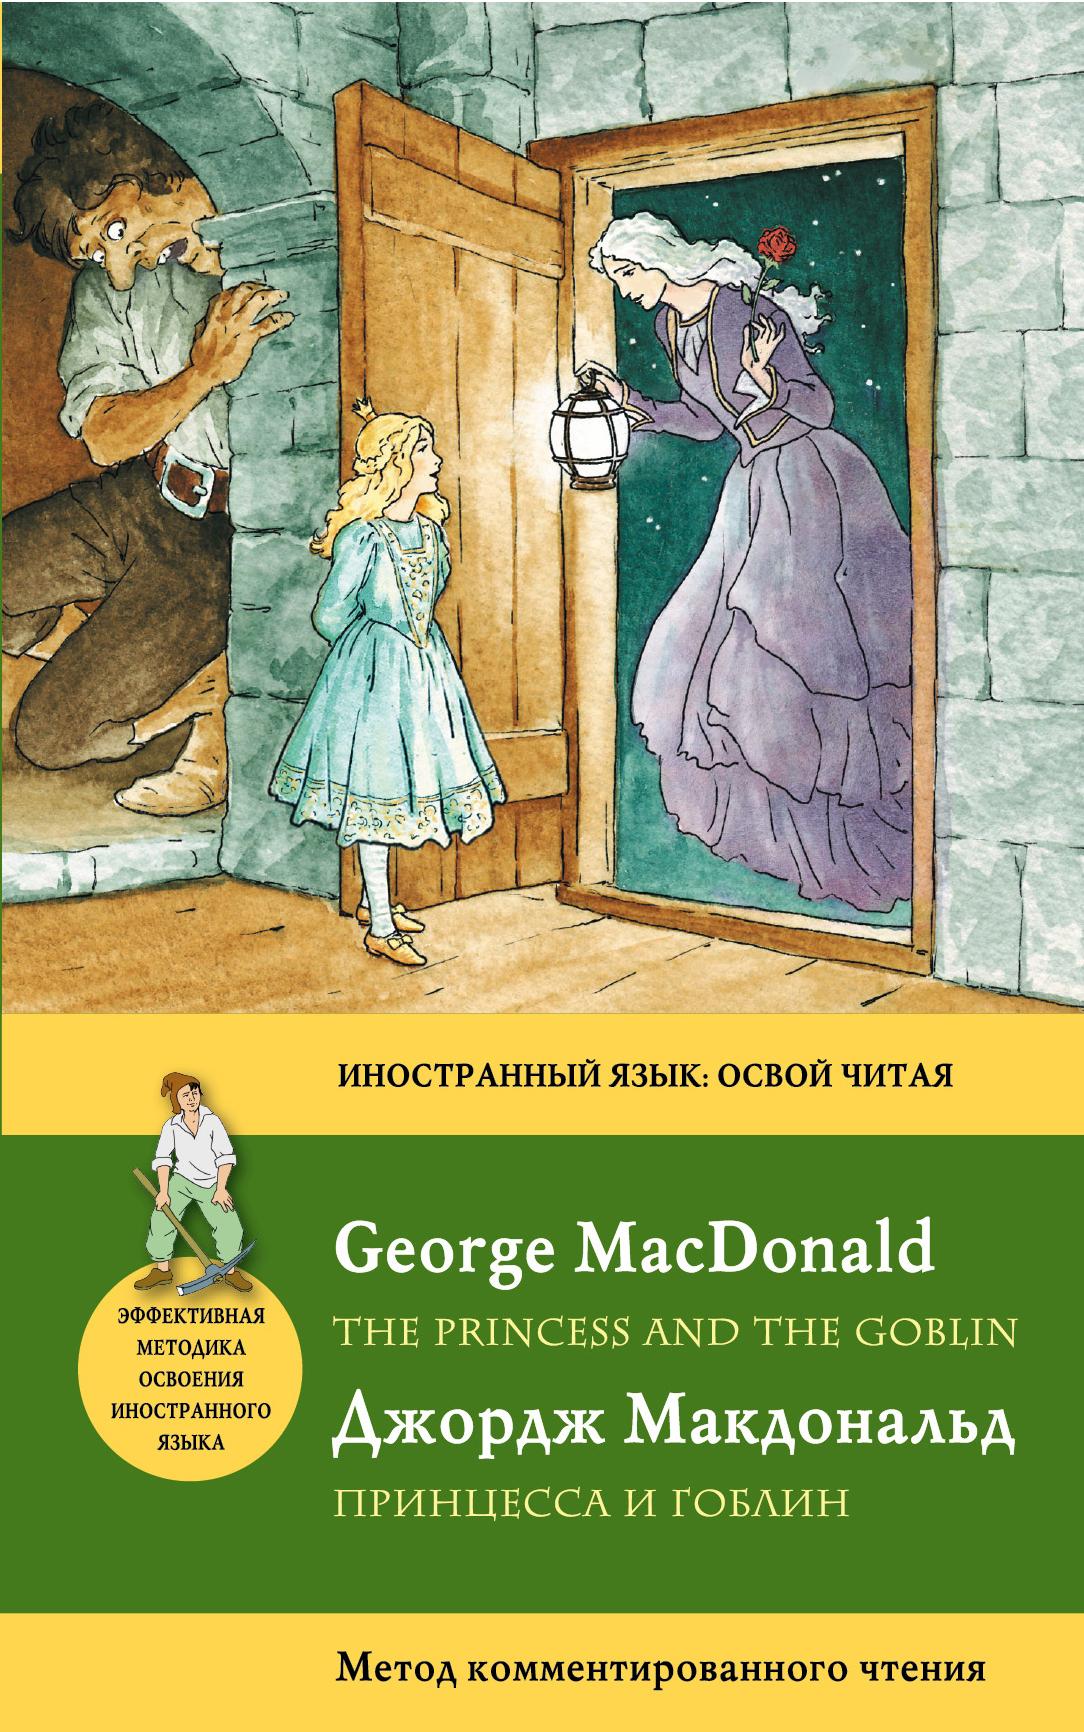 Макдональд Д. Принцесса и гоблин = The Princess and the Goblin. Метод комментированного чтения macdonald g the princess and the goblin a novel for children in english 1871 принцесса и гоблин